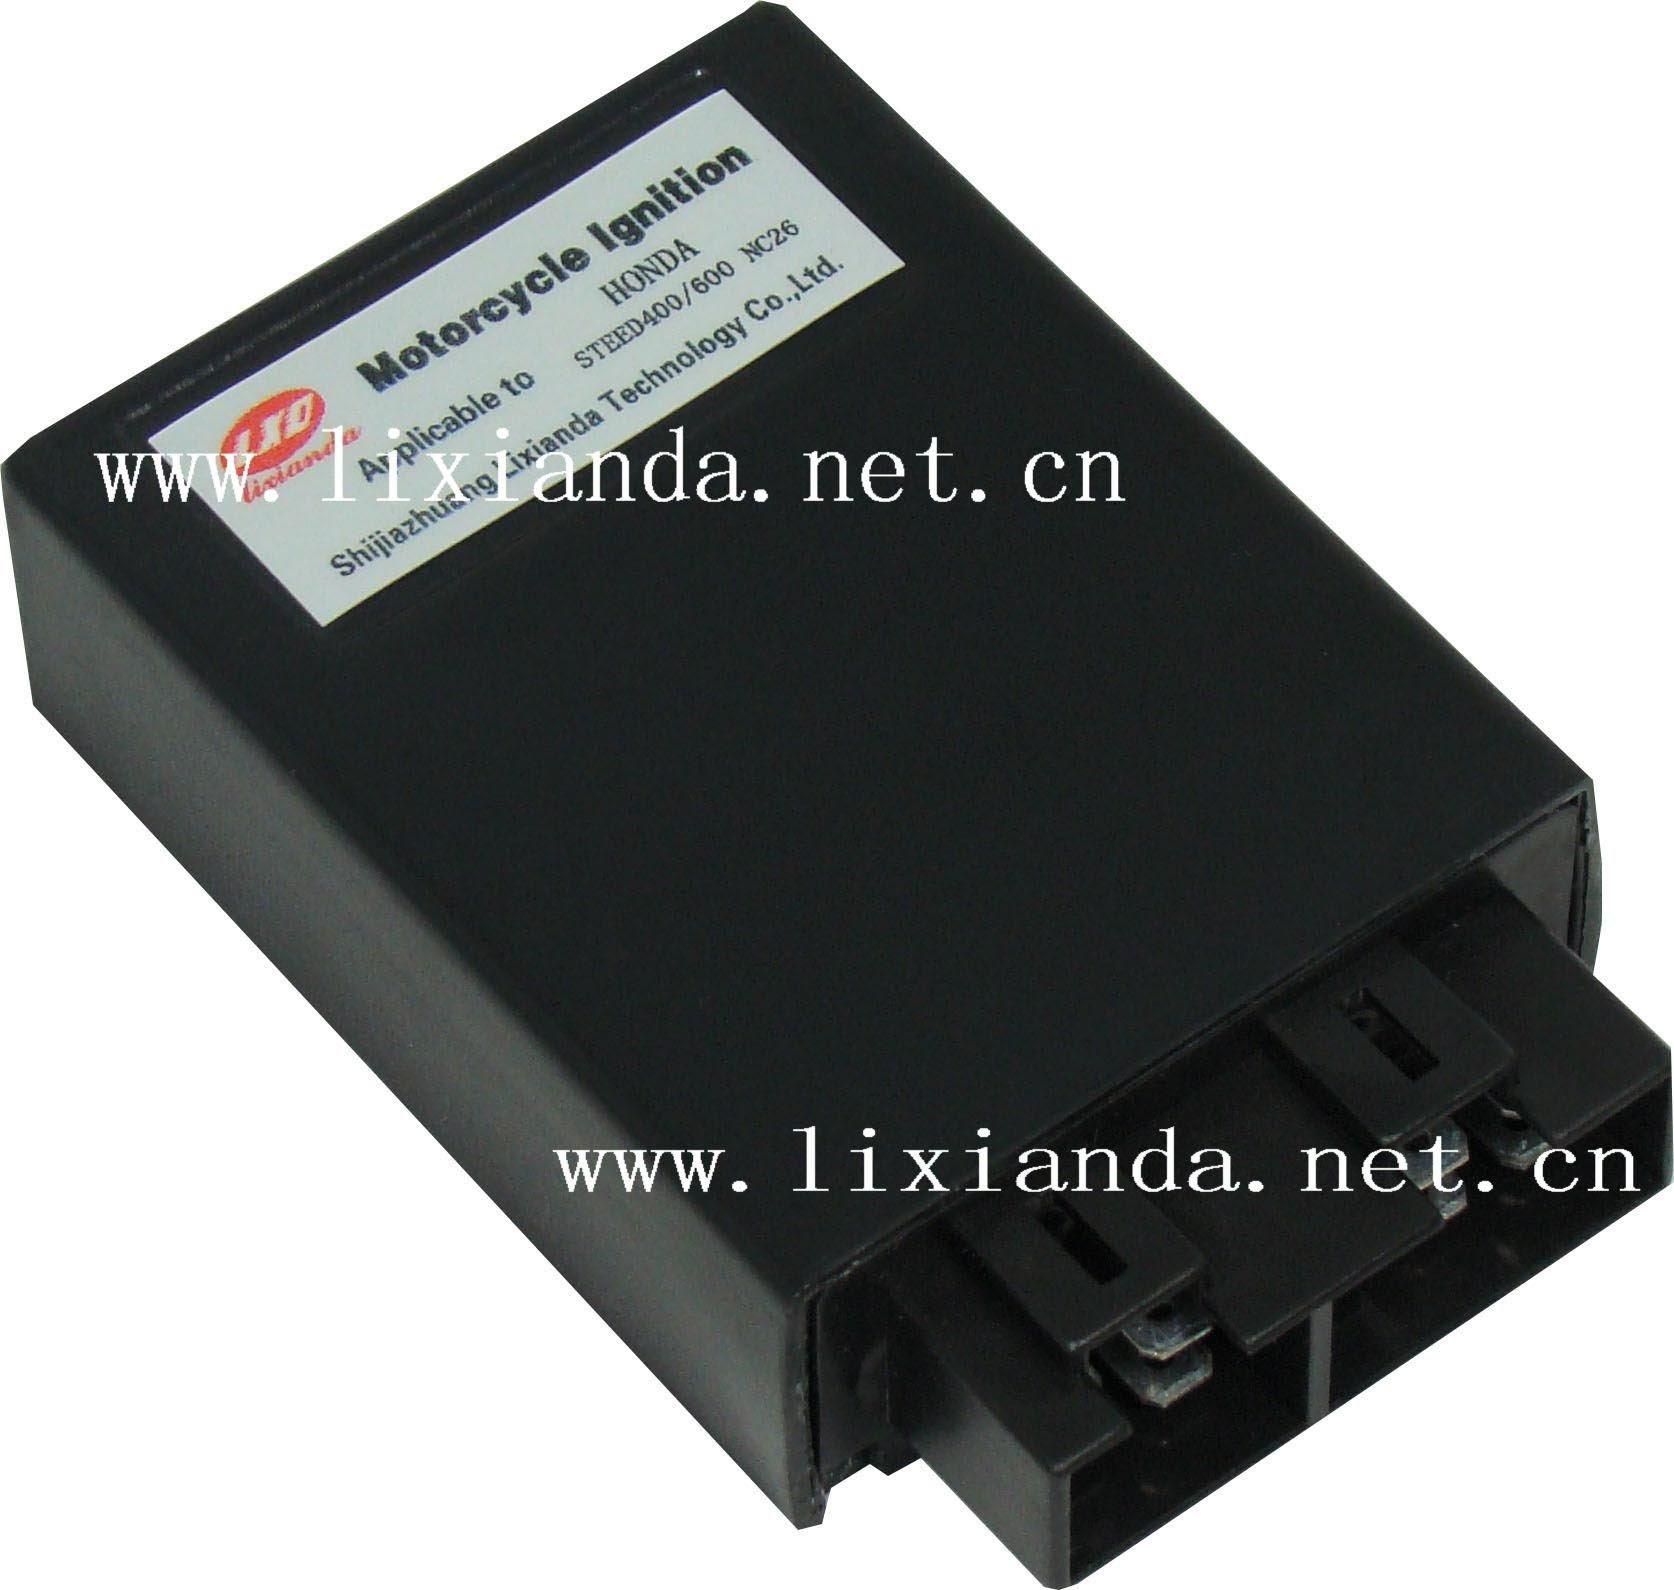 Digital Motorcycle Ignition CDI Unit Steed400 NC26 for Honda # LXD-NC26(China (Mainland))